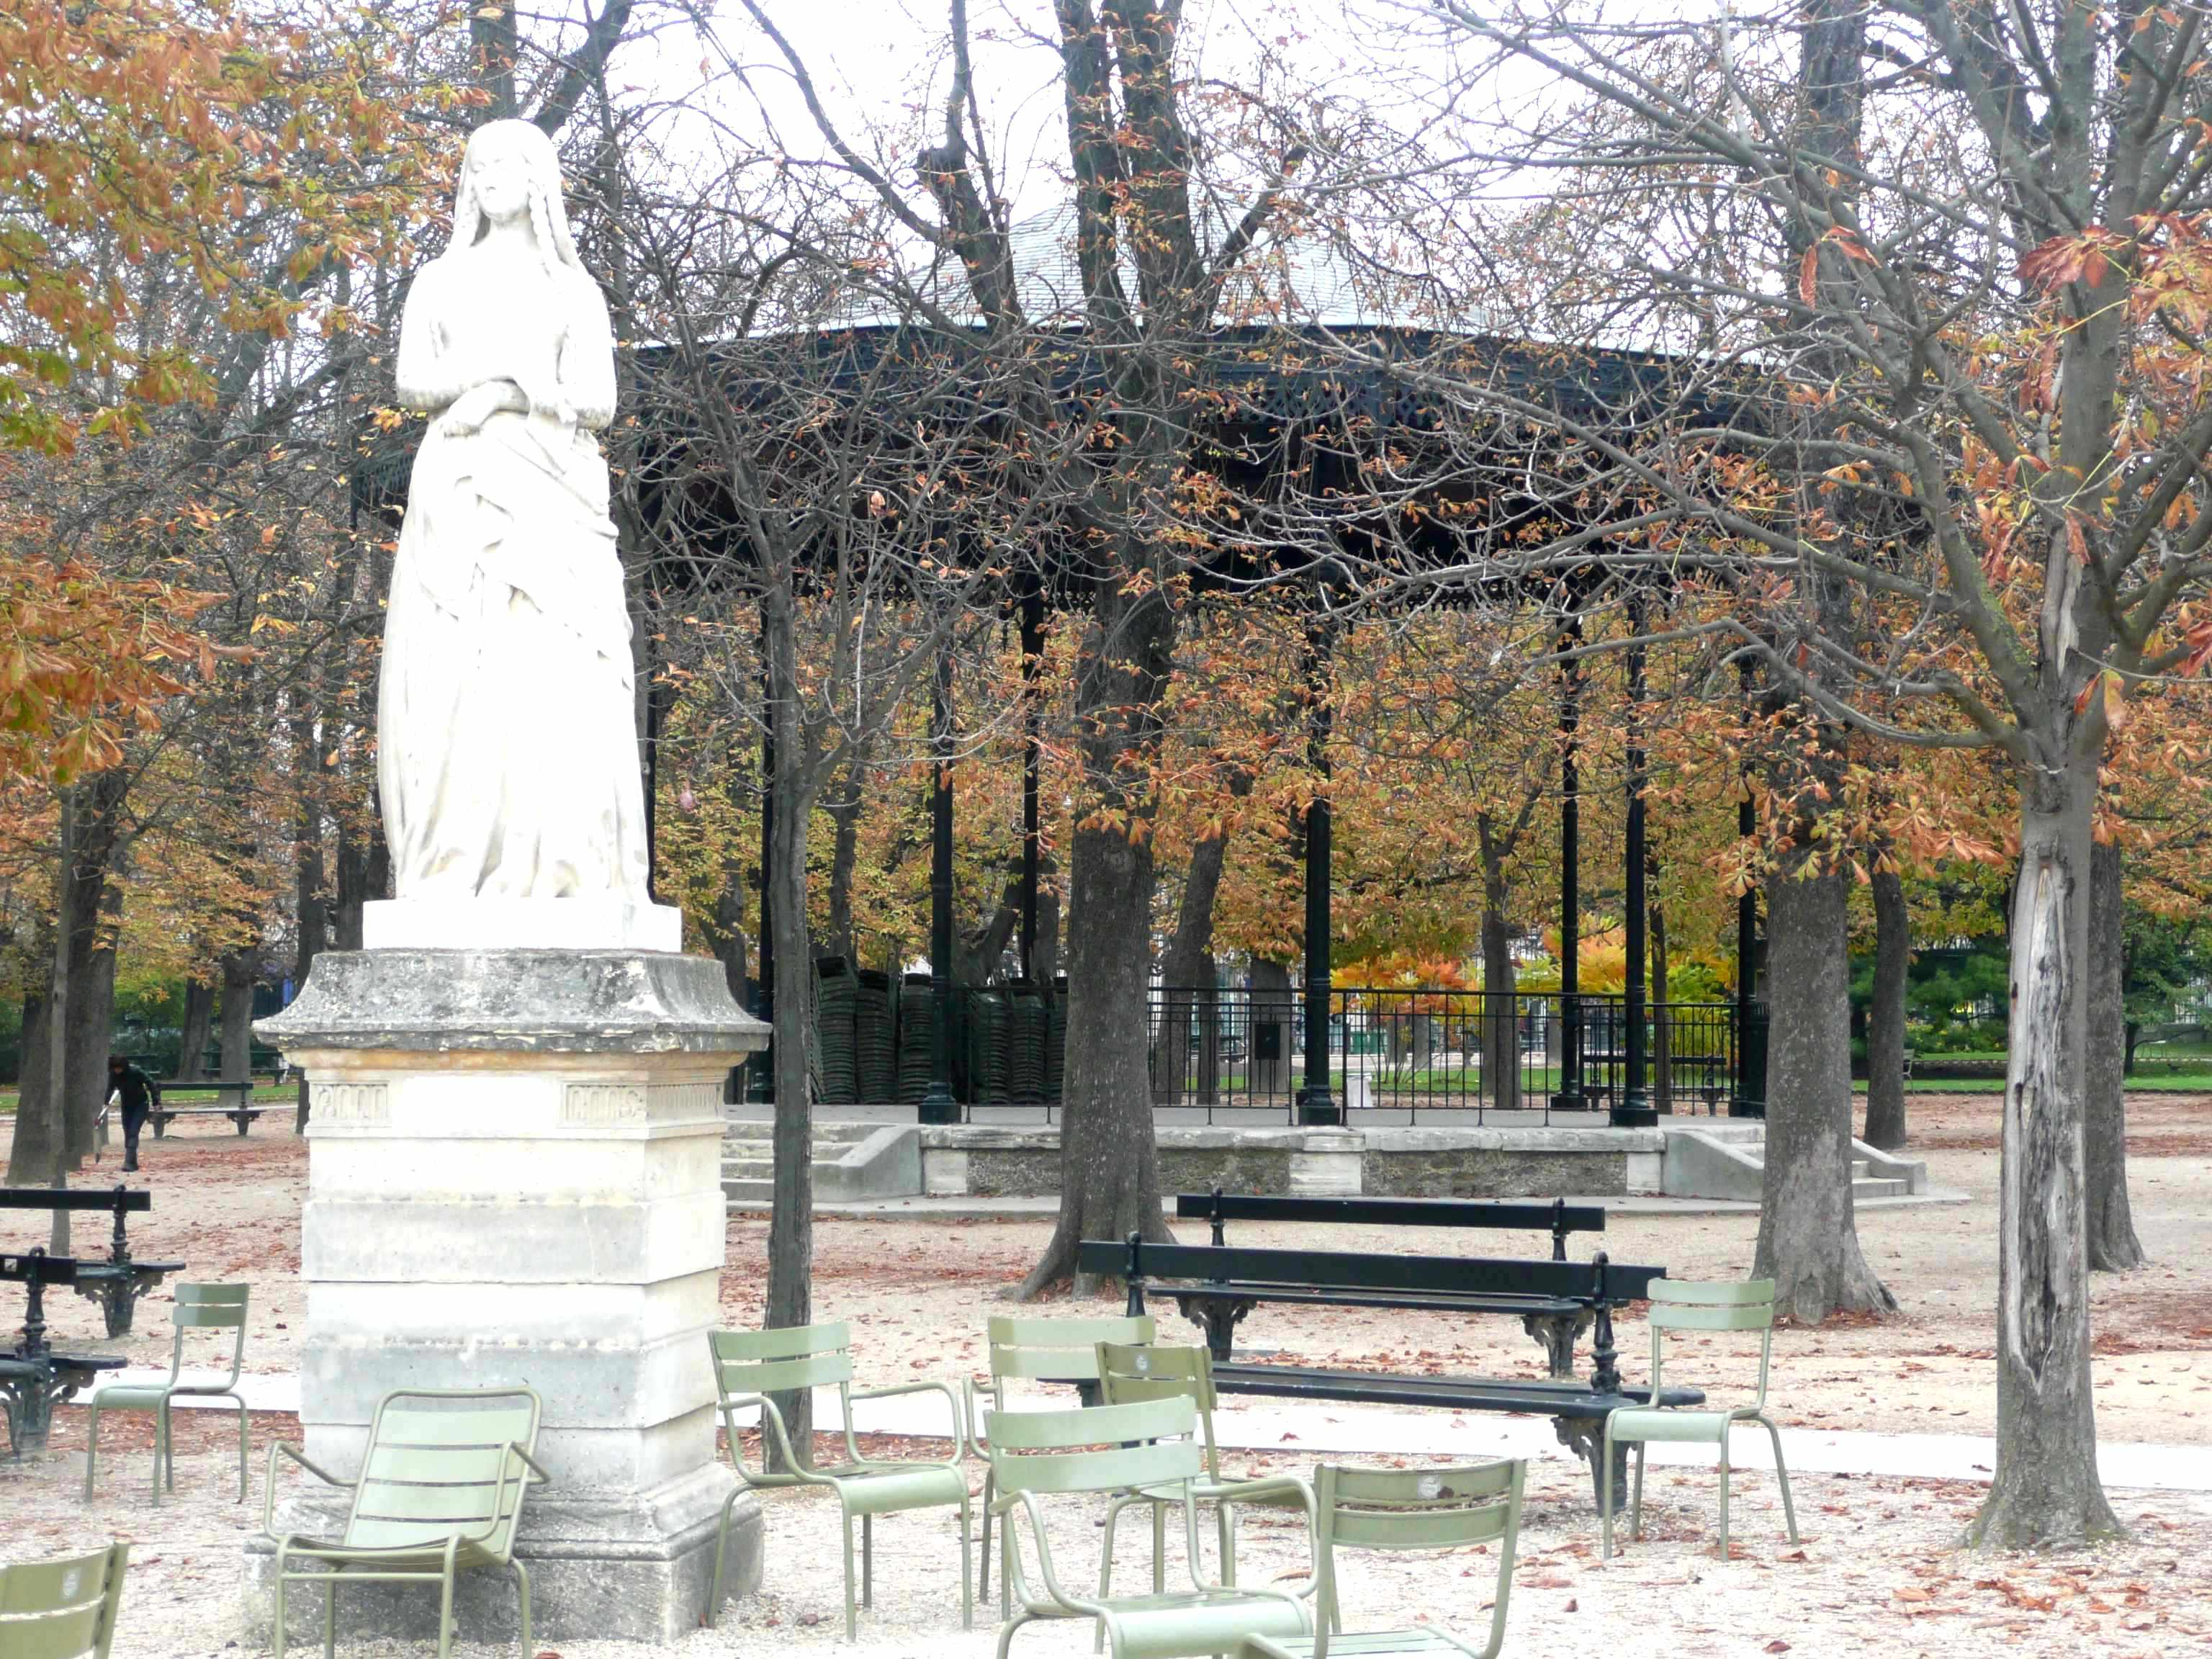 Automne au jardin du luxembourg for Chaise jardin du luxembourg